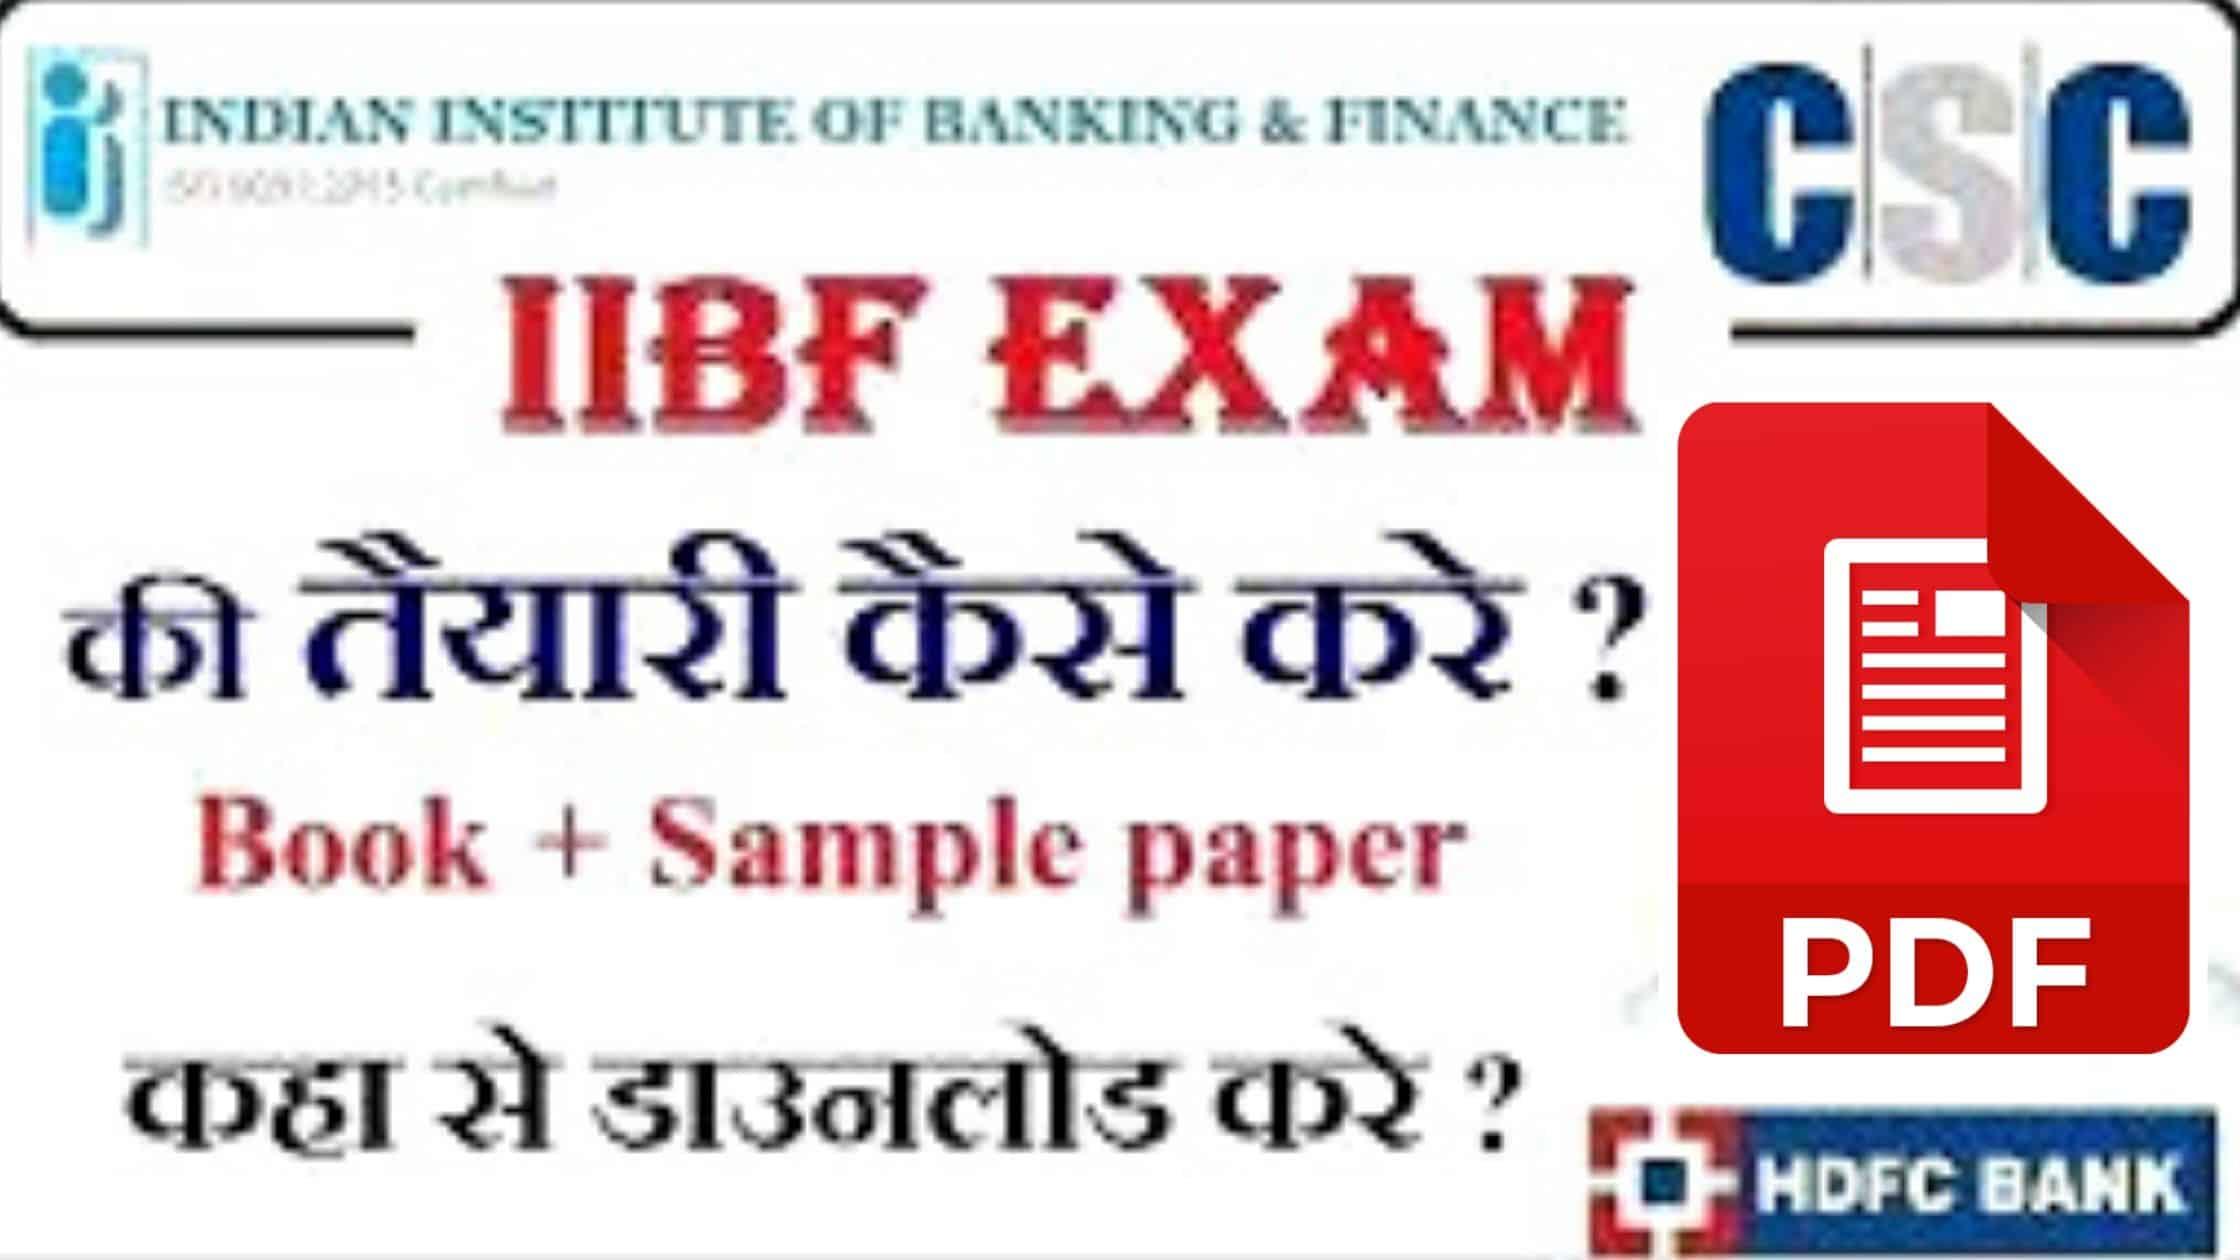 IIBF EXAM REGISTRATION PROCESS